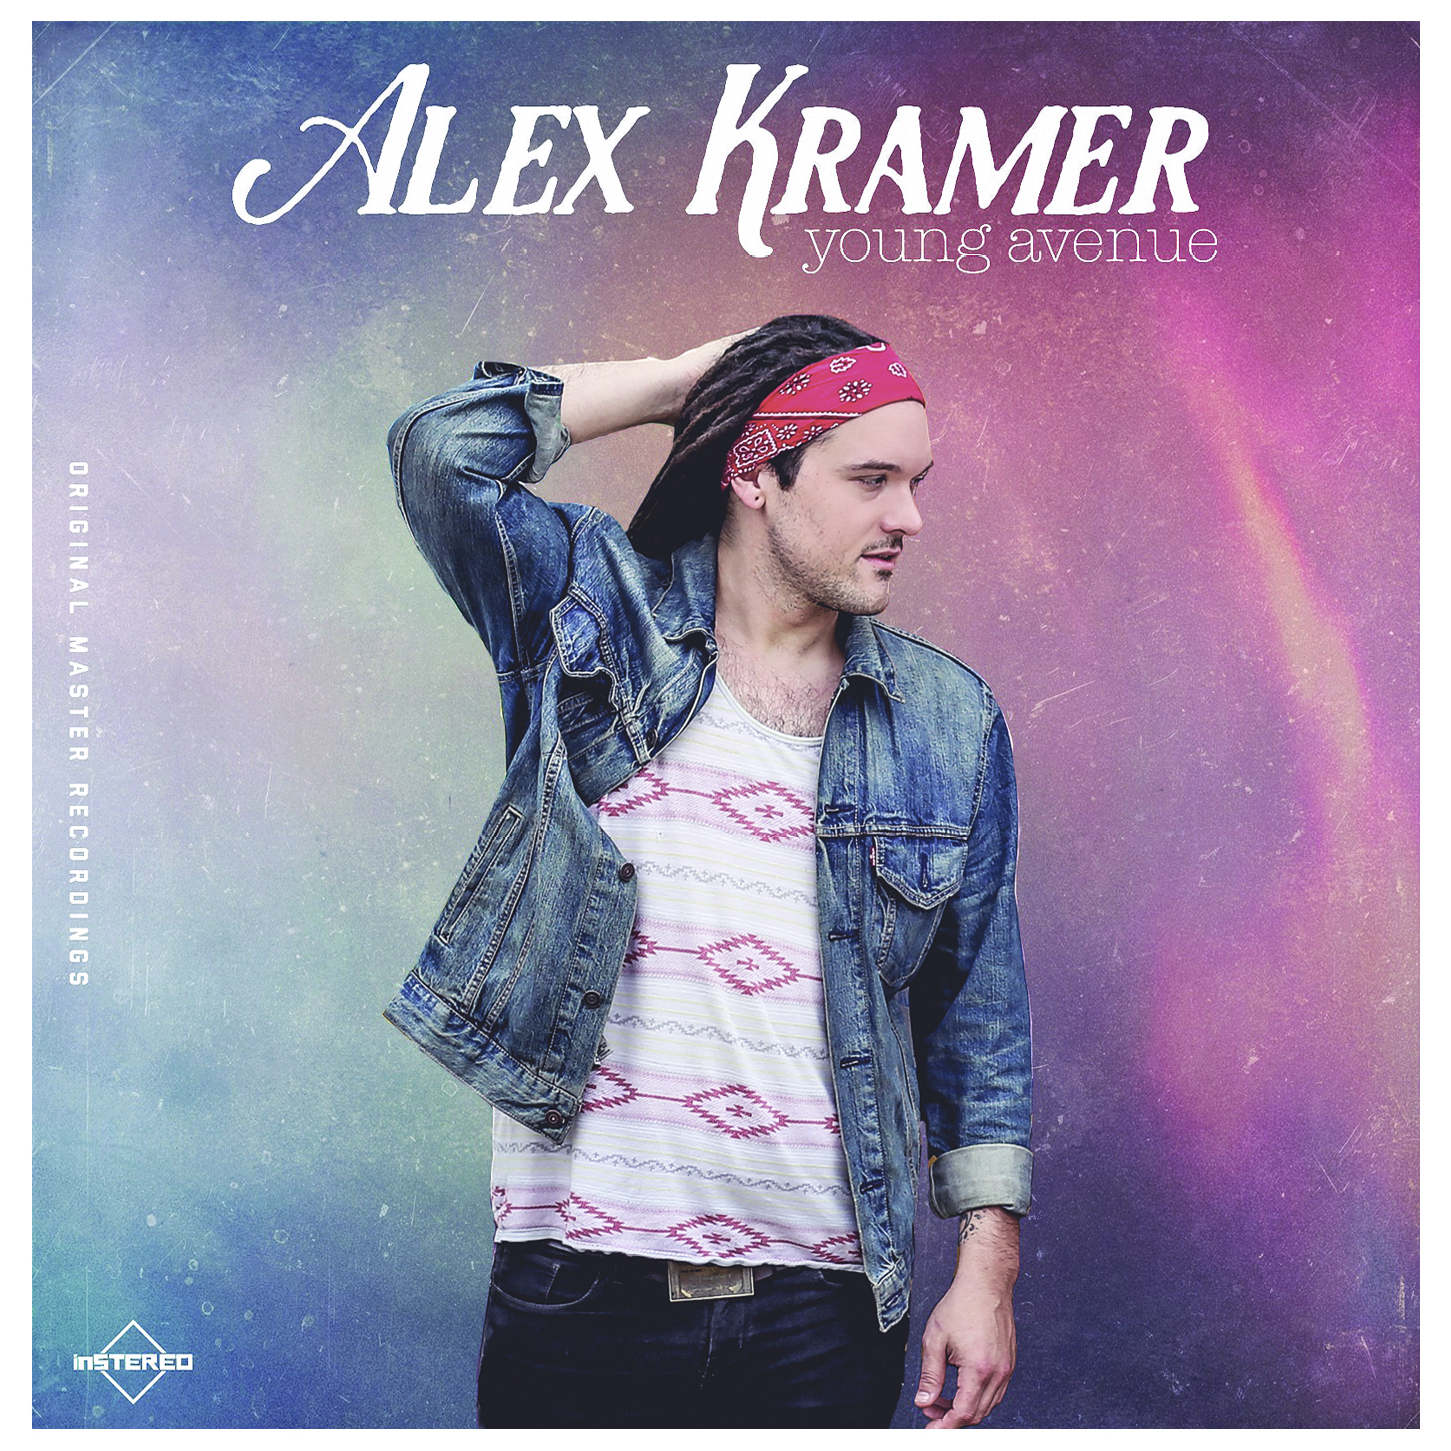 Alex Kramer / Young Avenue Percussion. Sound Design. Drums. 2017